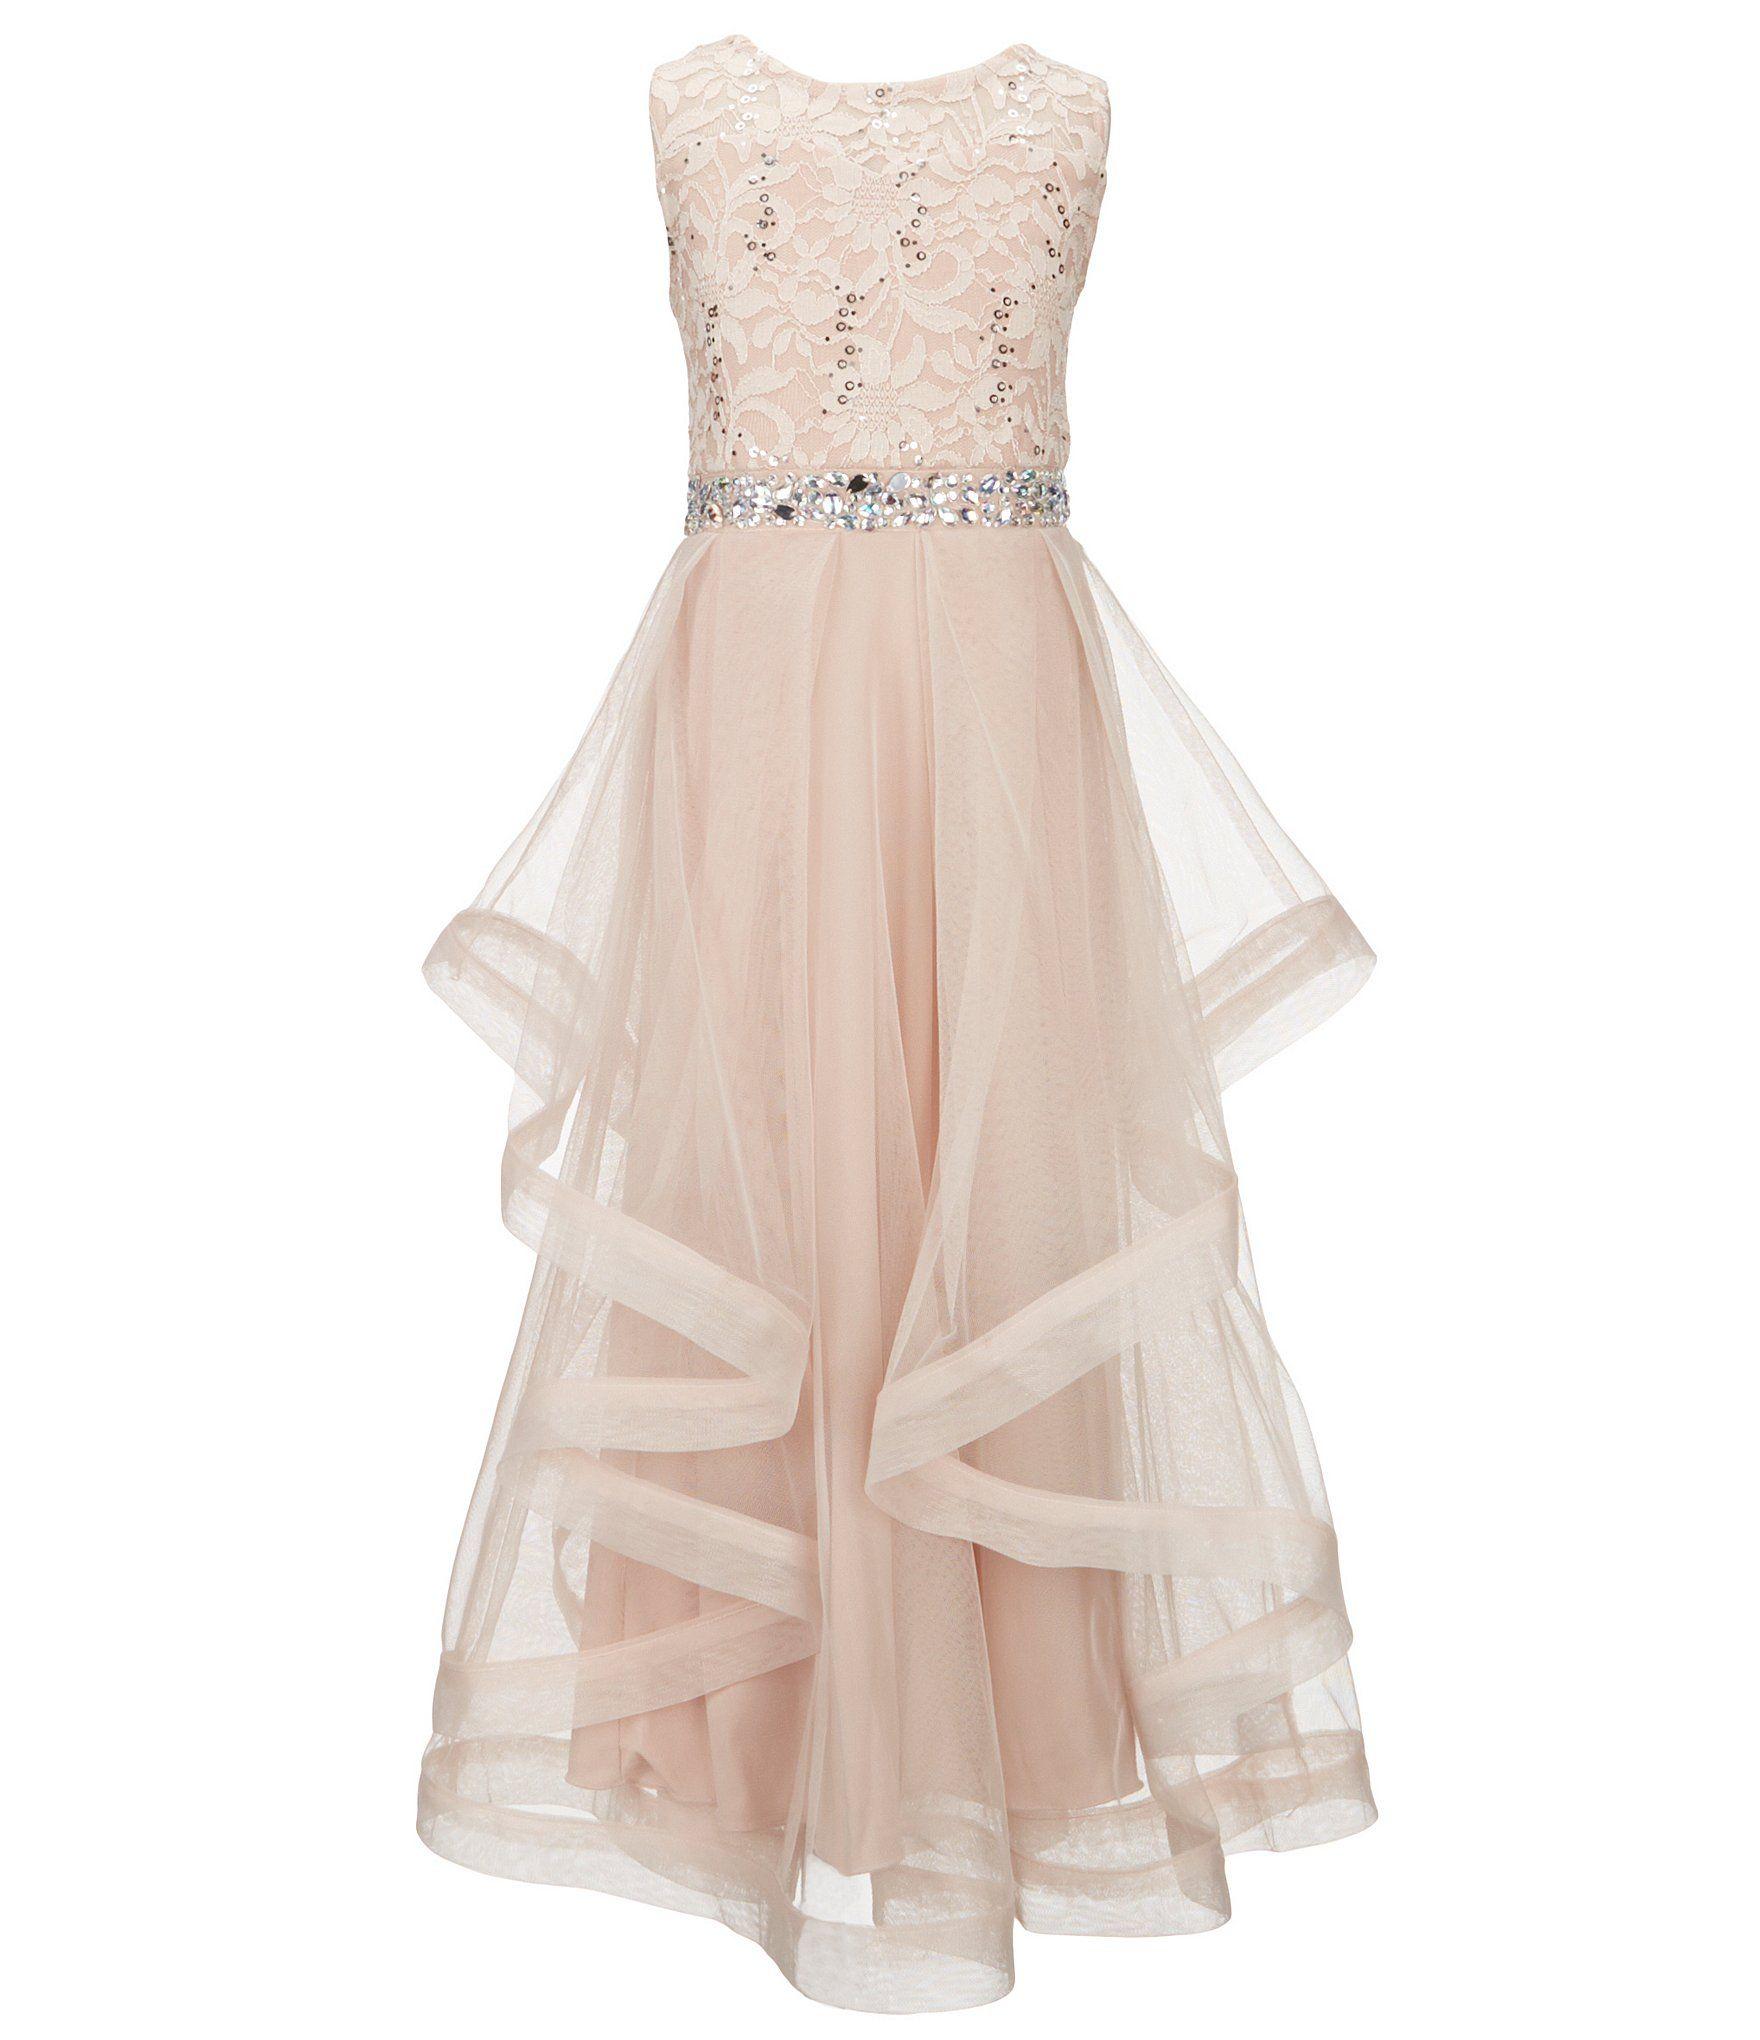 215ba10f3e5e Shop for Xtraordinary Big Girls 7-16 Sequin Lace Sheer Mesh Long Dress at  Dillards.com. Visit Dillards.com to find clothing